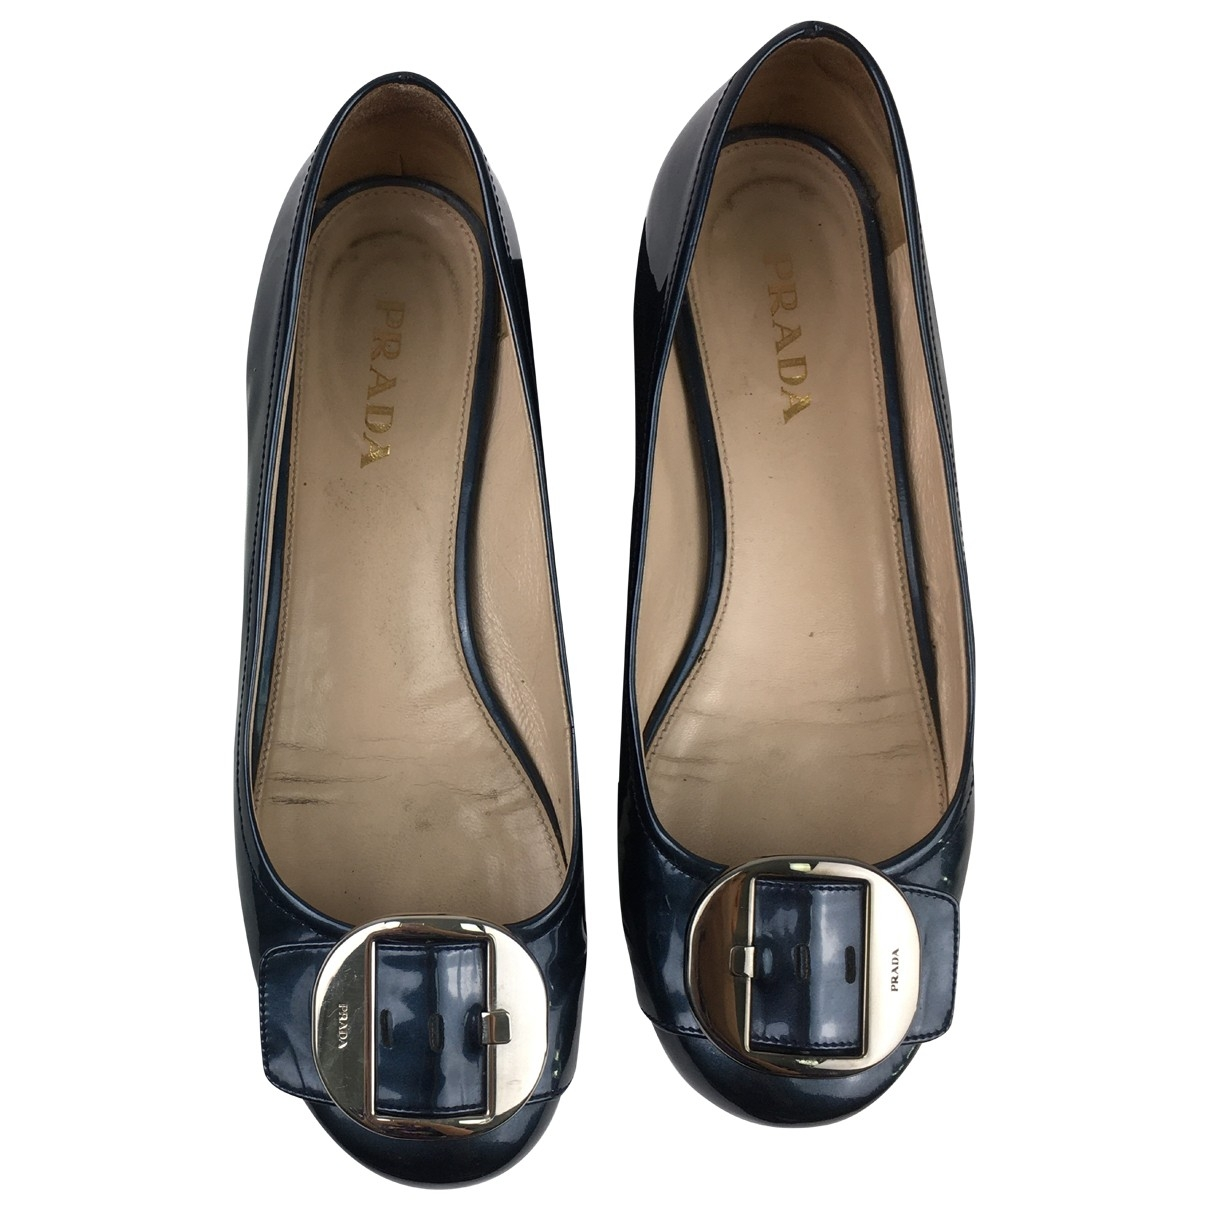 Prada \N Blue Patent leather Ballet flats for Women 39 EU